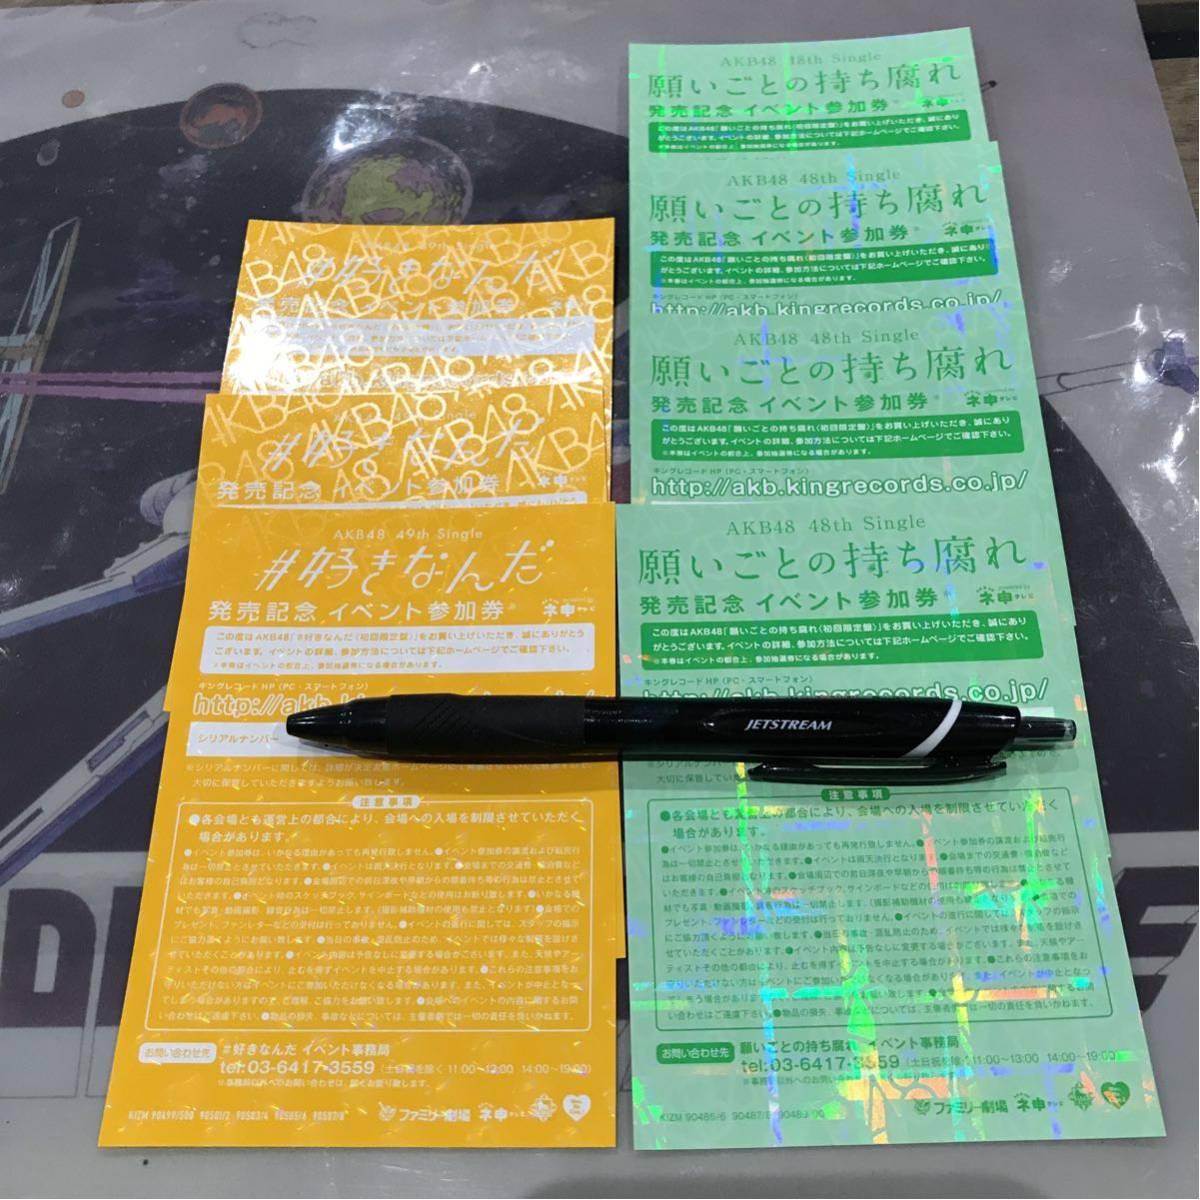 AKB48 願いごとの持ち腐れ #好きなんだ イベント参加券 握手券 7枚セット